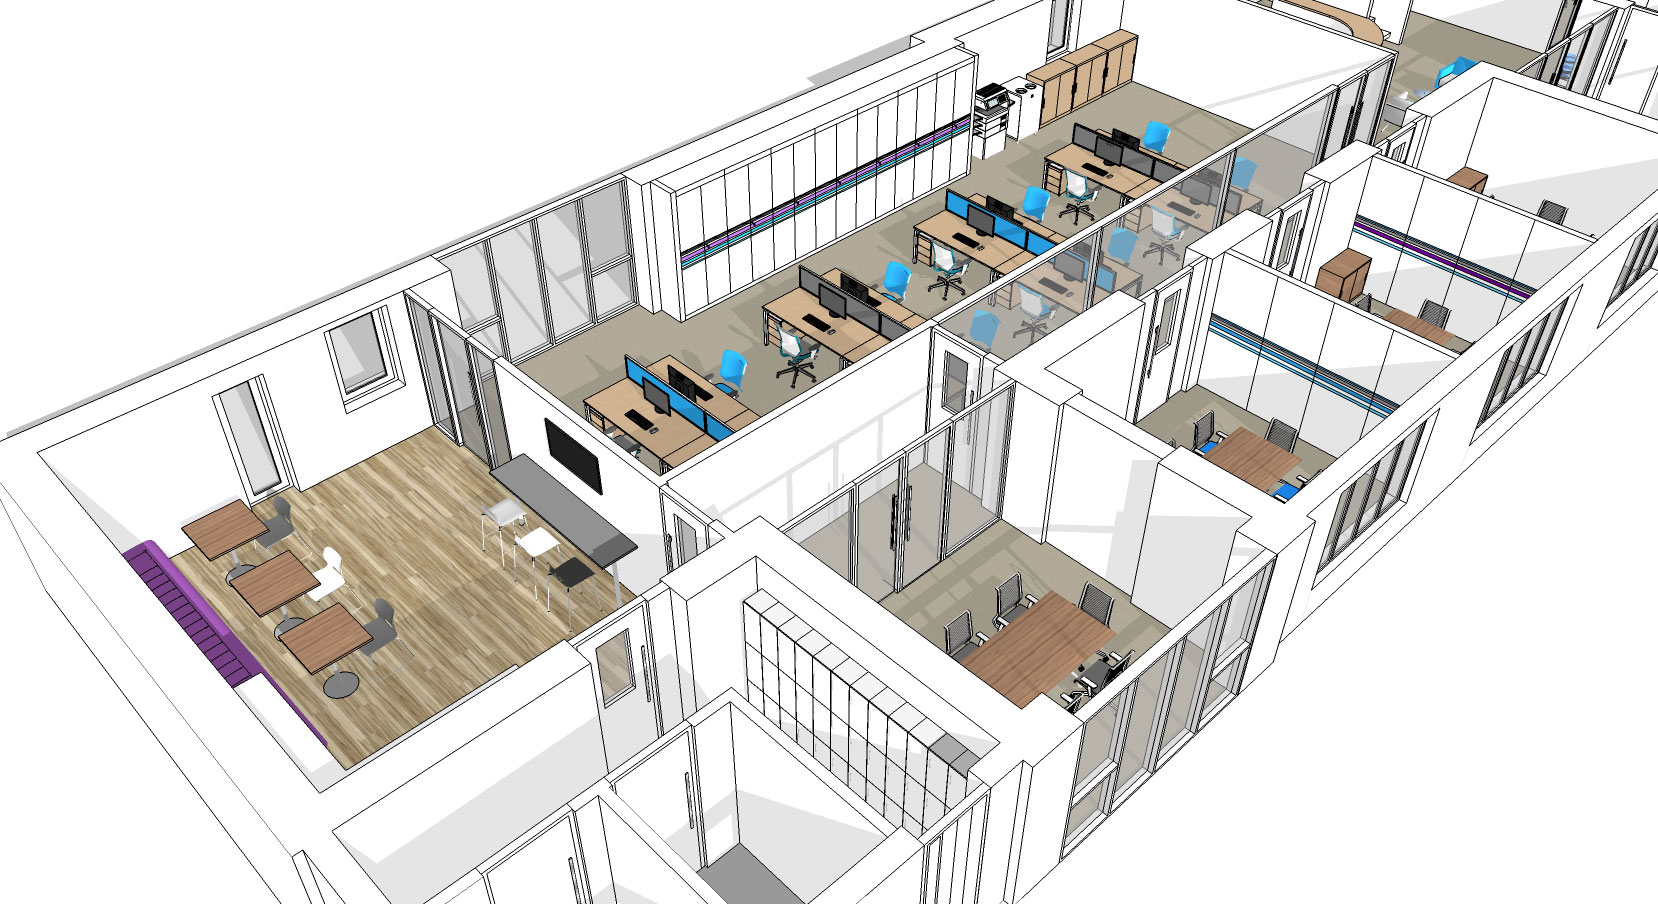 ashtons legal-workspace-design-plan visual